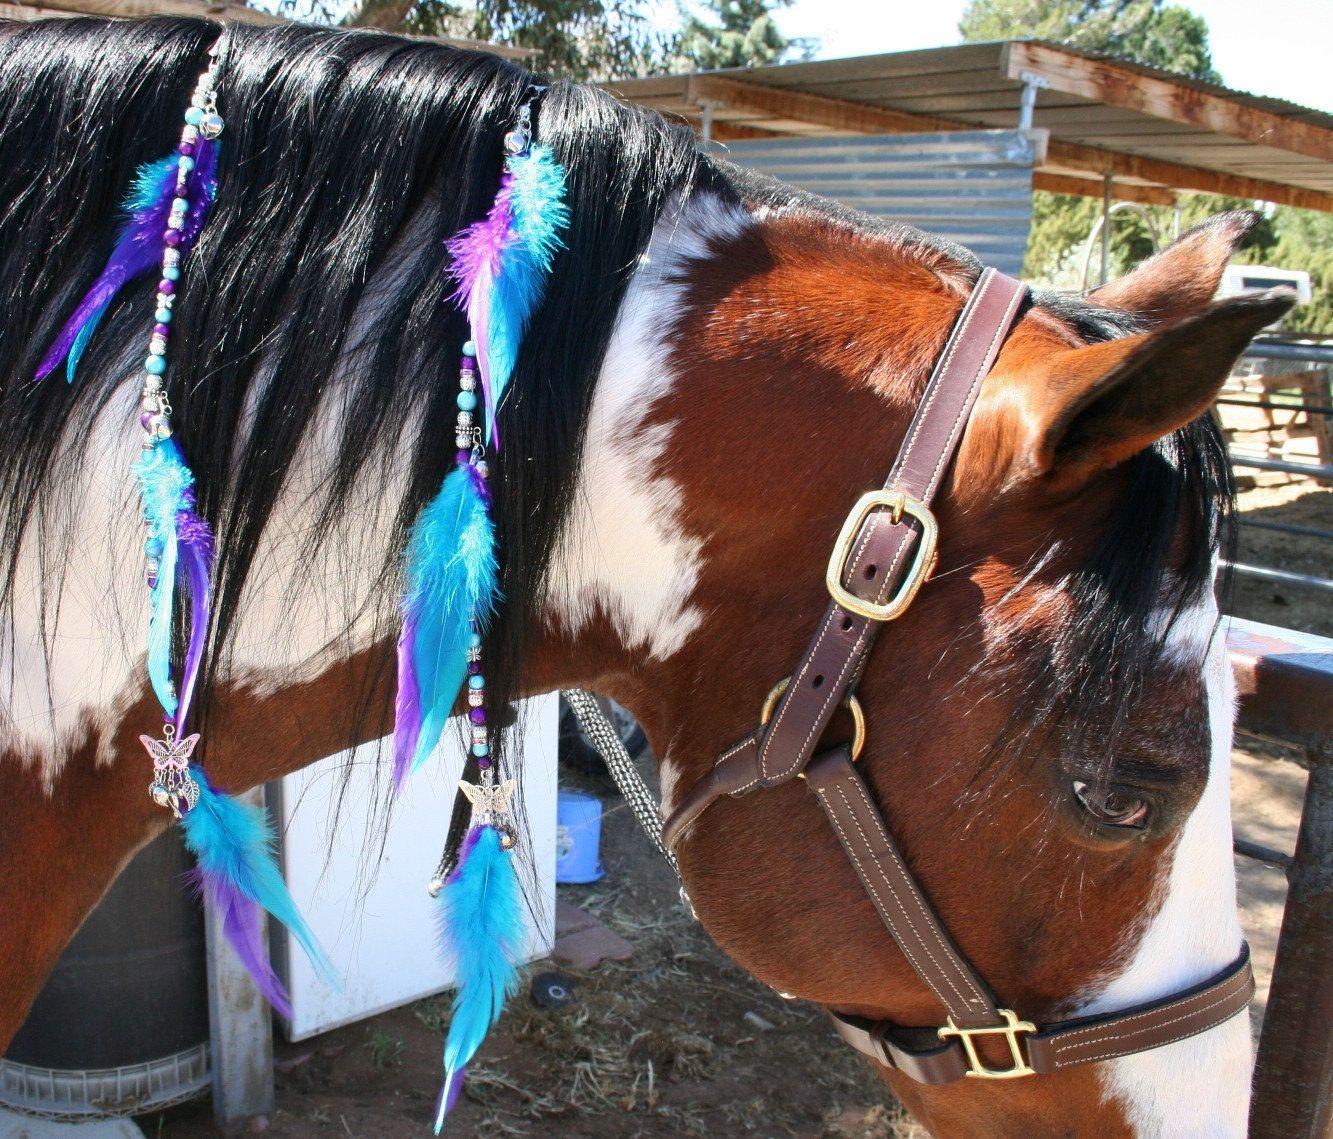 Rhythm And Beads Equine Ponies Horse Rhythm Beads for Horses Parades Rhythm Beads Horses Horse Riding Beads For Horses For Horses